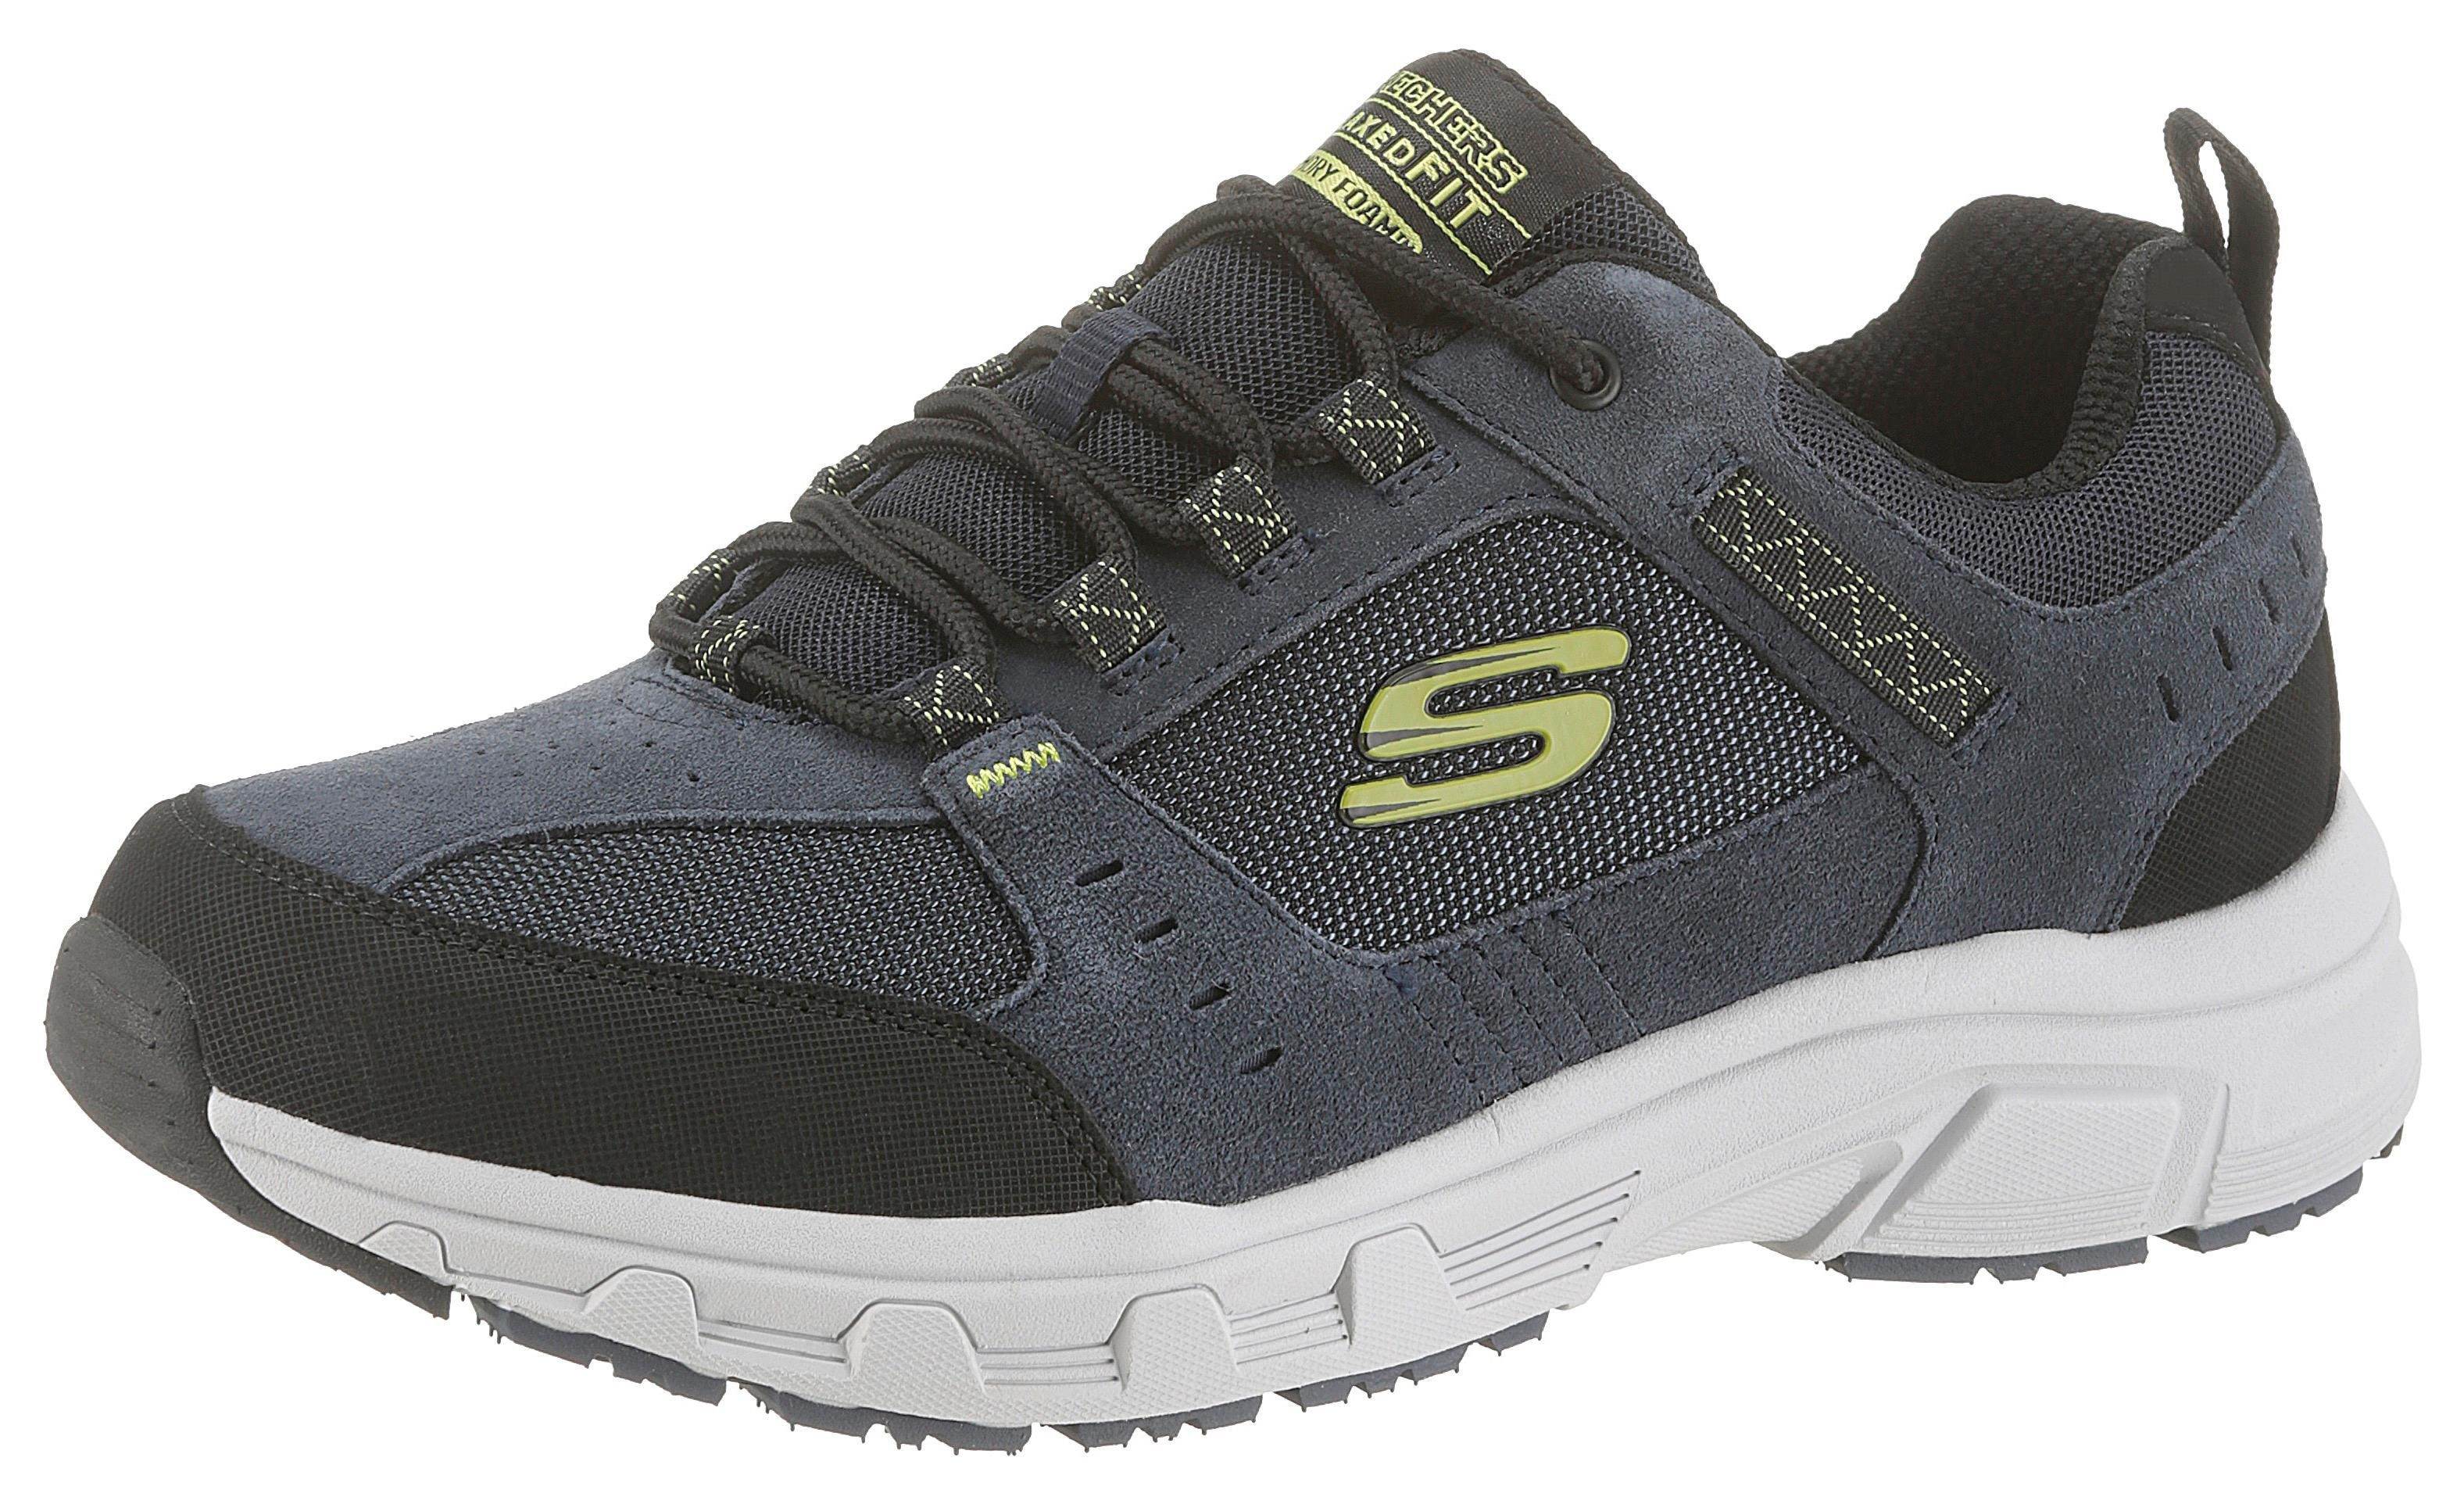 Skechers »Oak Canyon« Sneaker mit bequemer Memory Foam Ausstattung online kaufen | OTTO